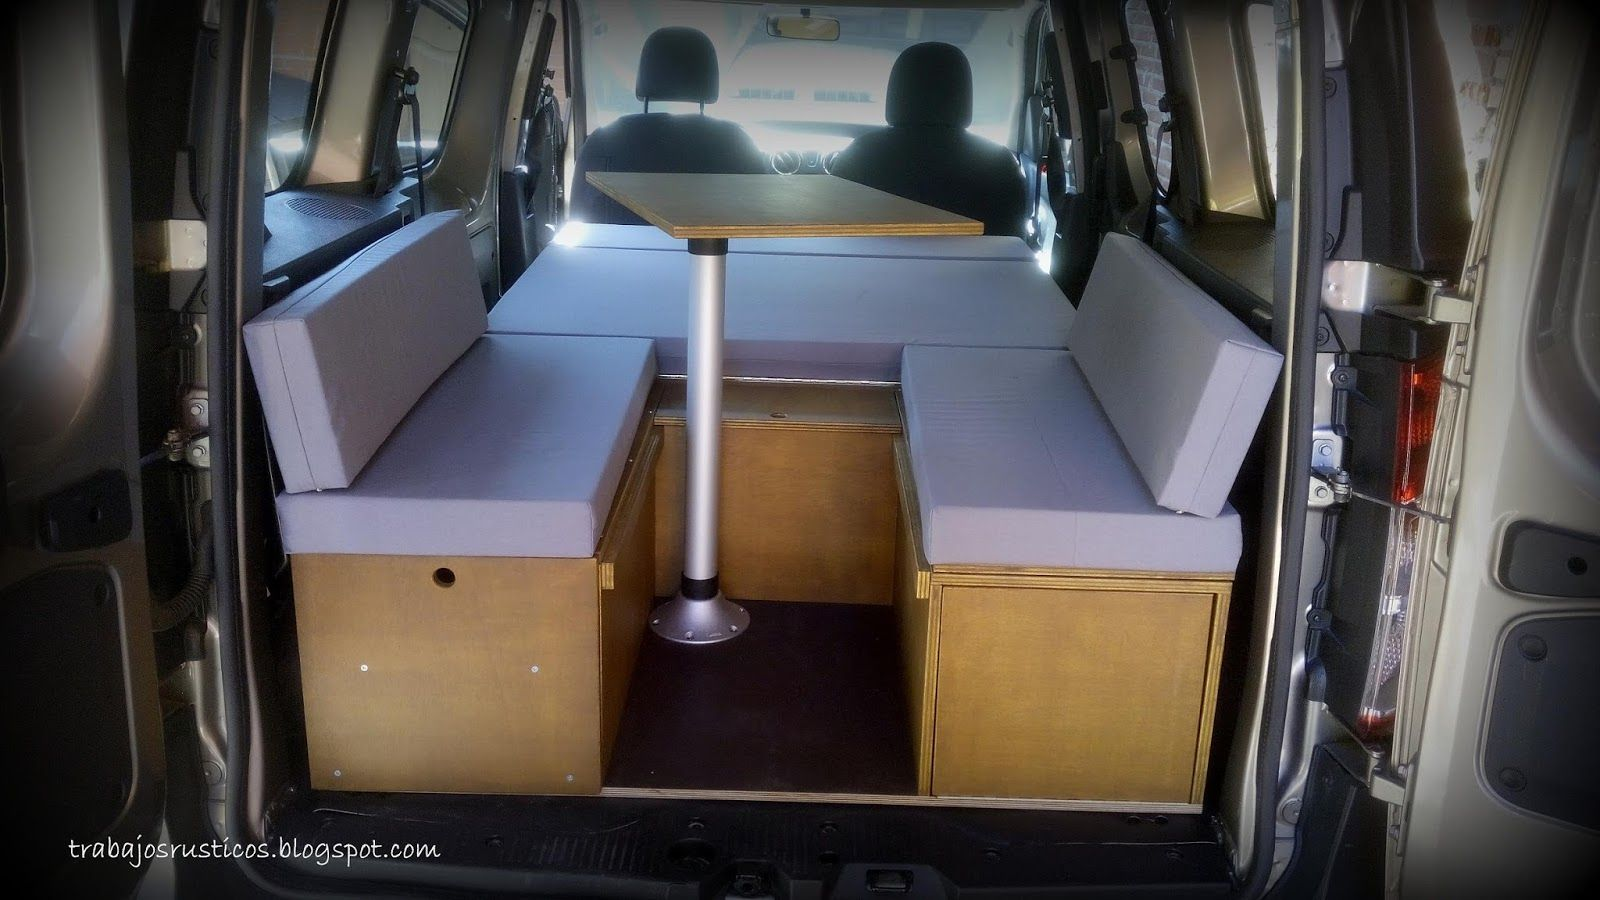 Artesan A Madera Muebles De Madera R Sticos Camperizaciones  # Muebles Peugeot Boxer